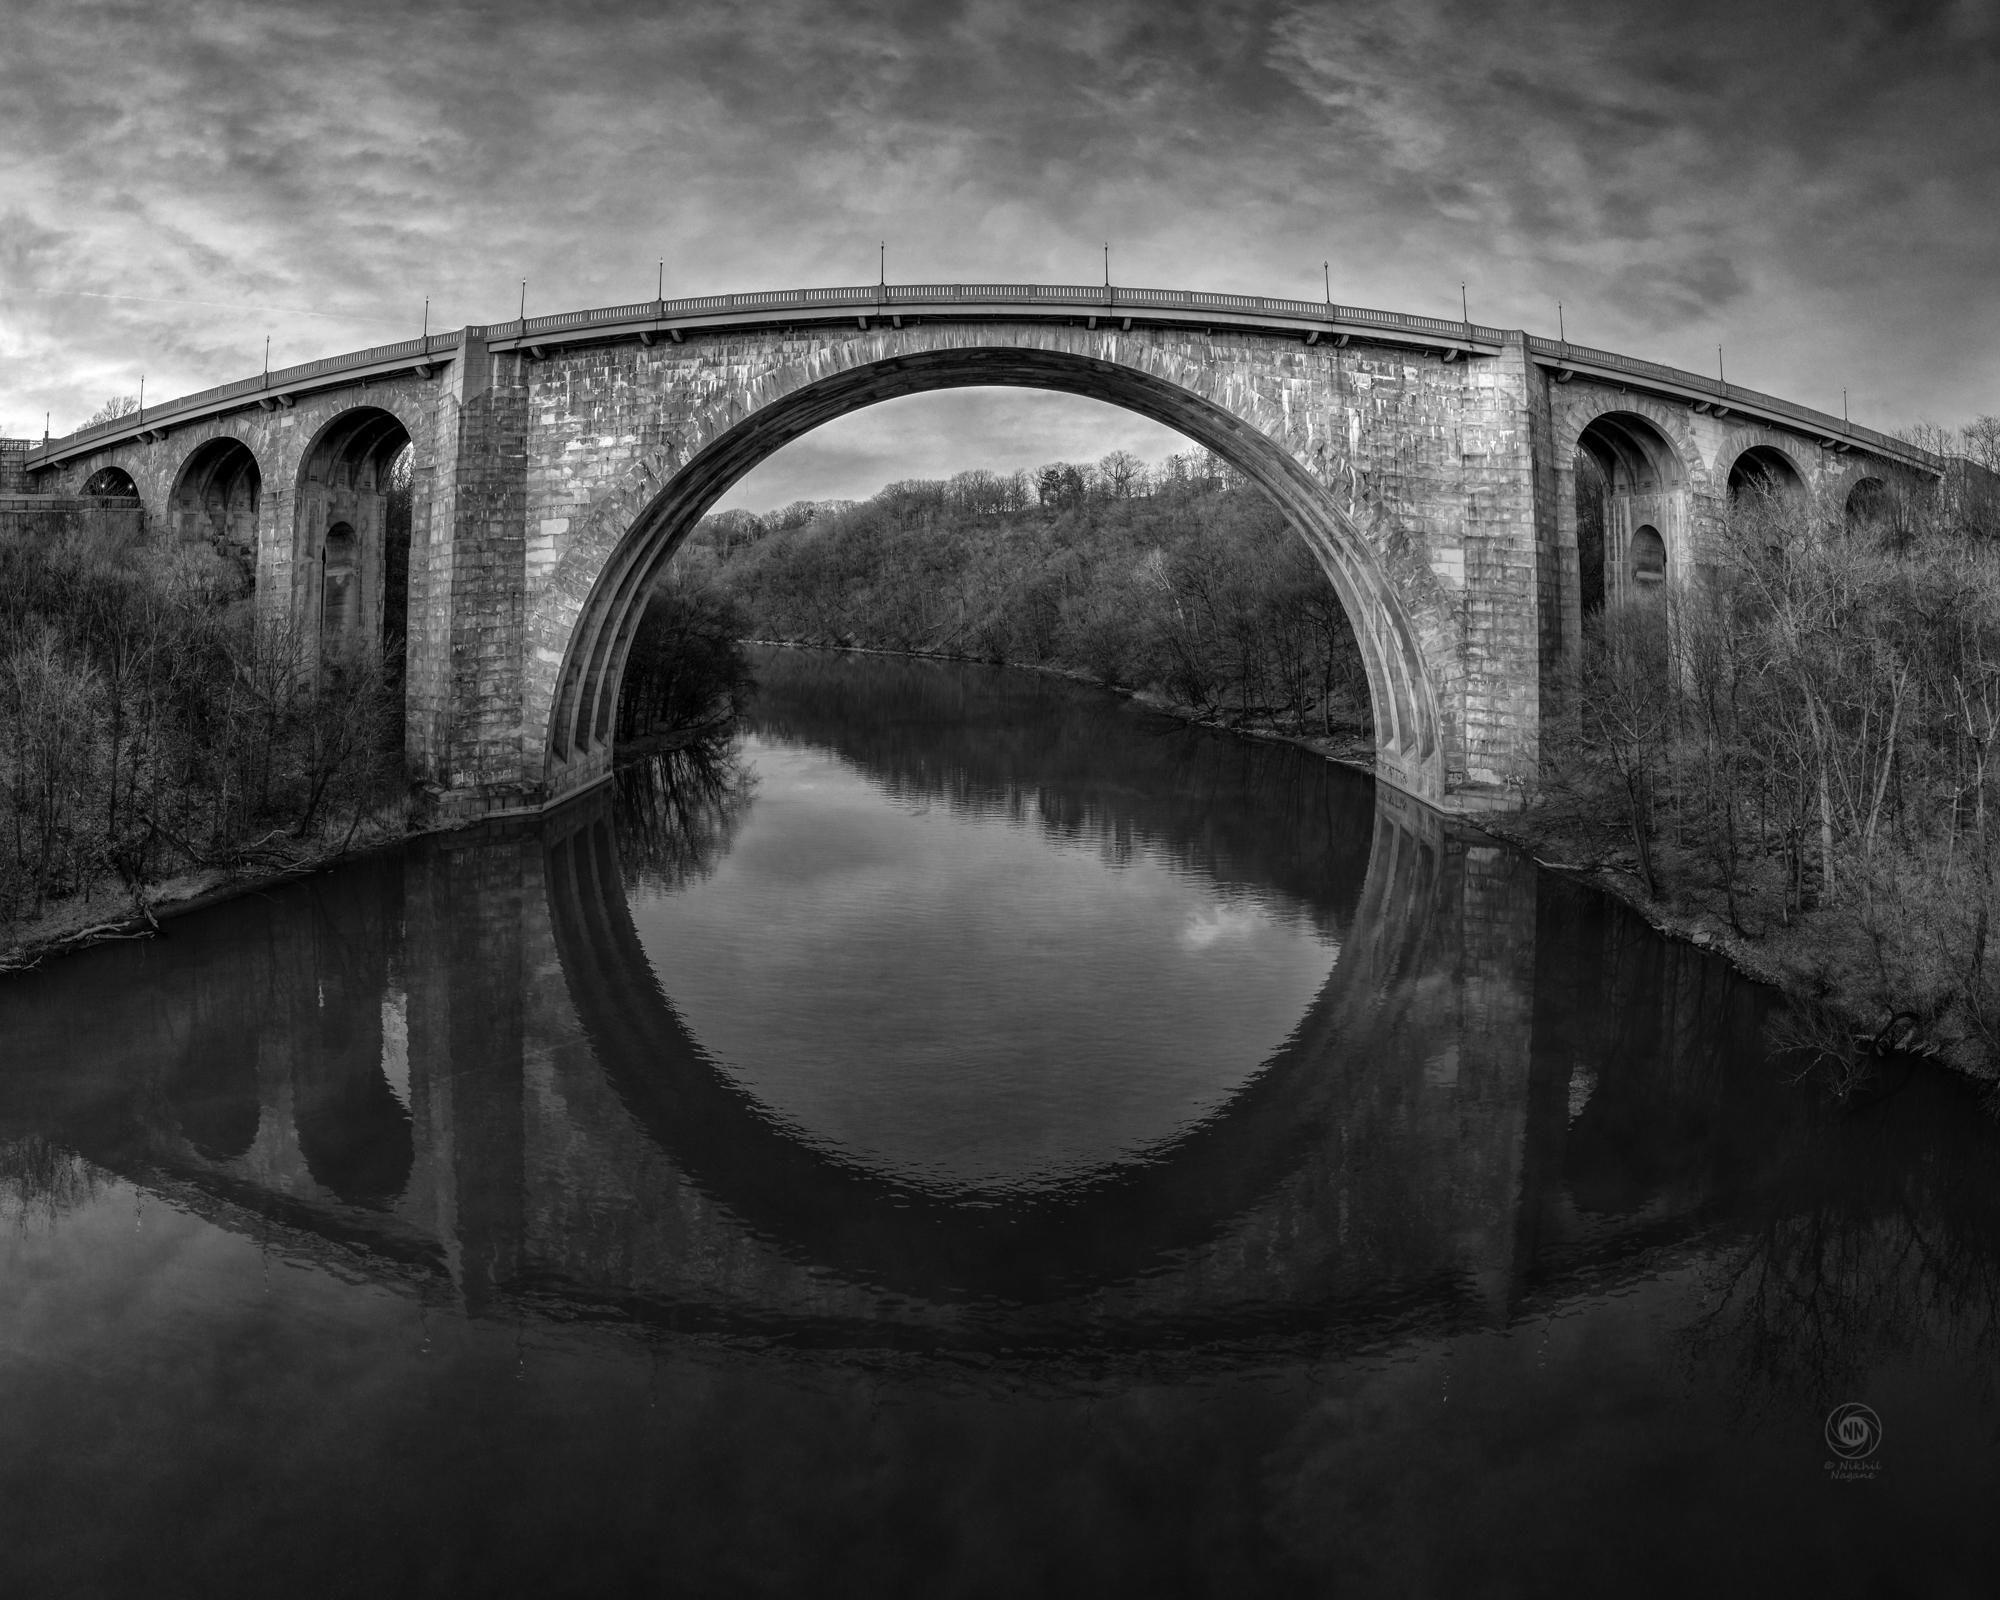 Veterans memorial bridge on the Genesee river [2000X1600